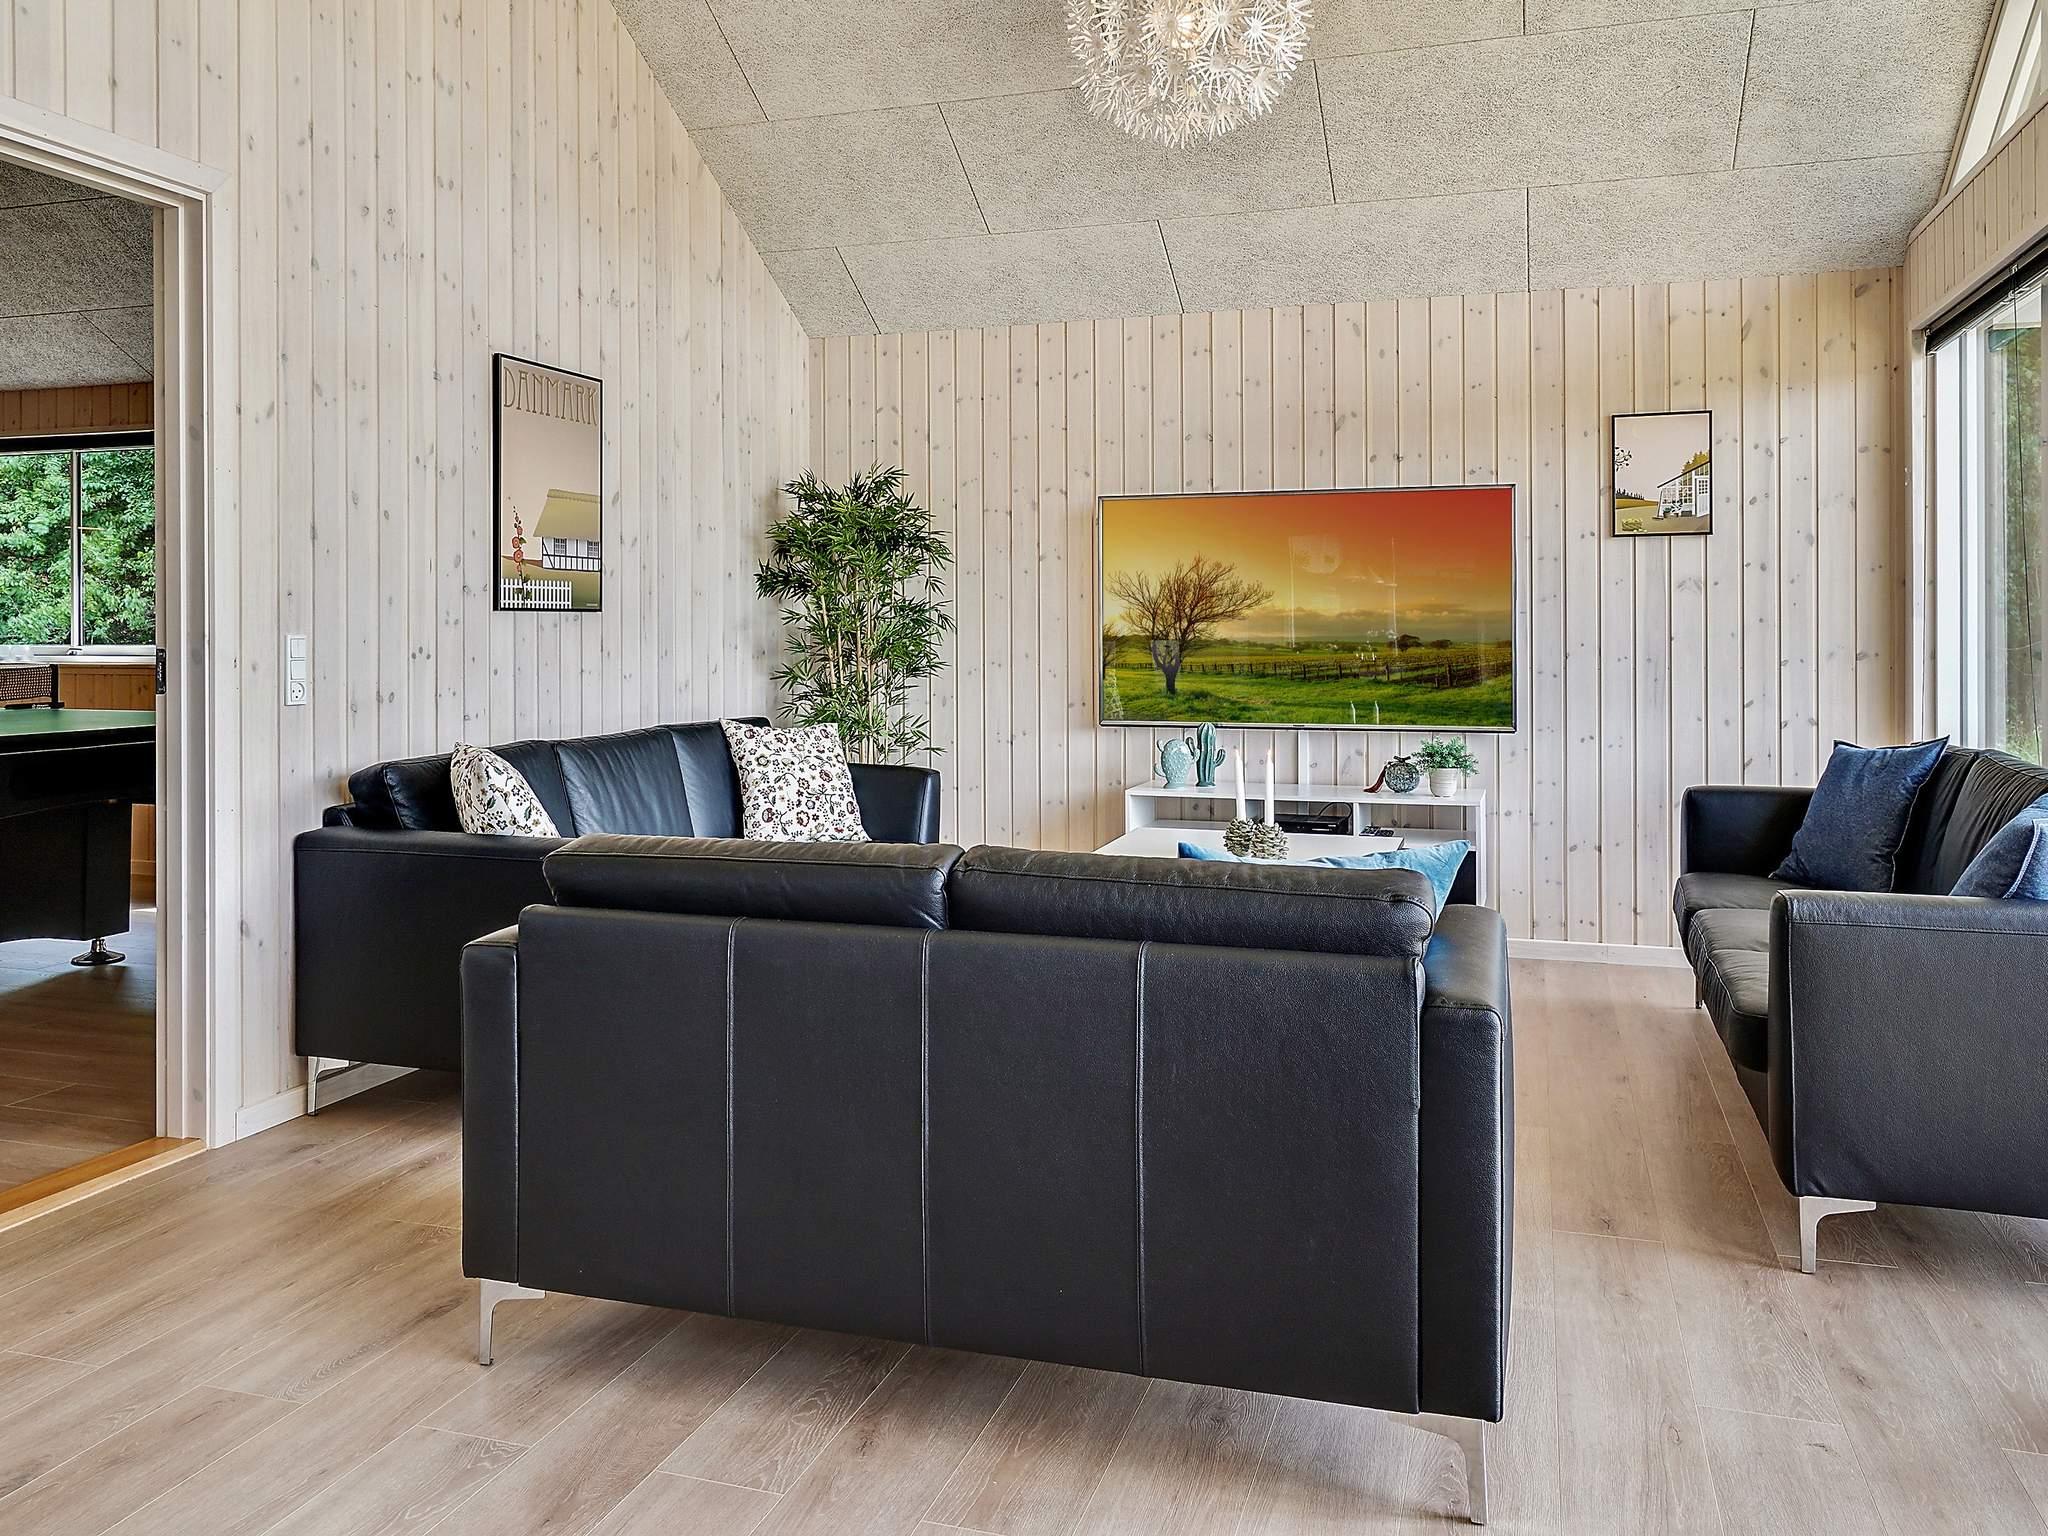 Ferienhaus Vejby Strand (2354752), Vejby, , Nordseeland, Dänemark, Bild 3